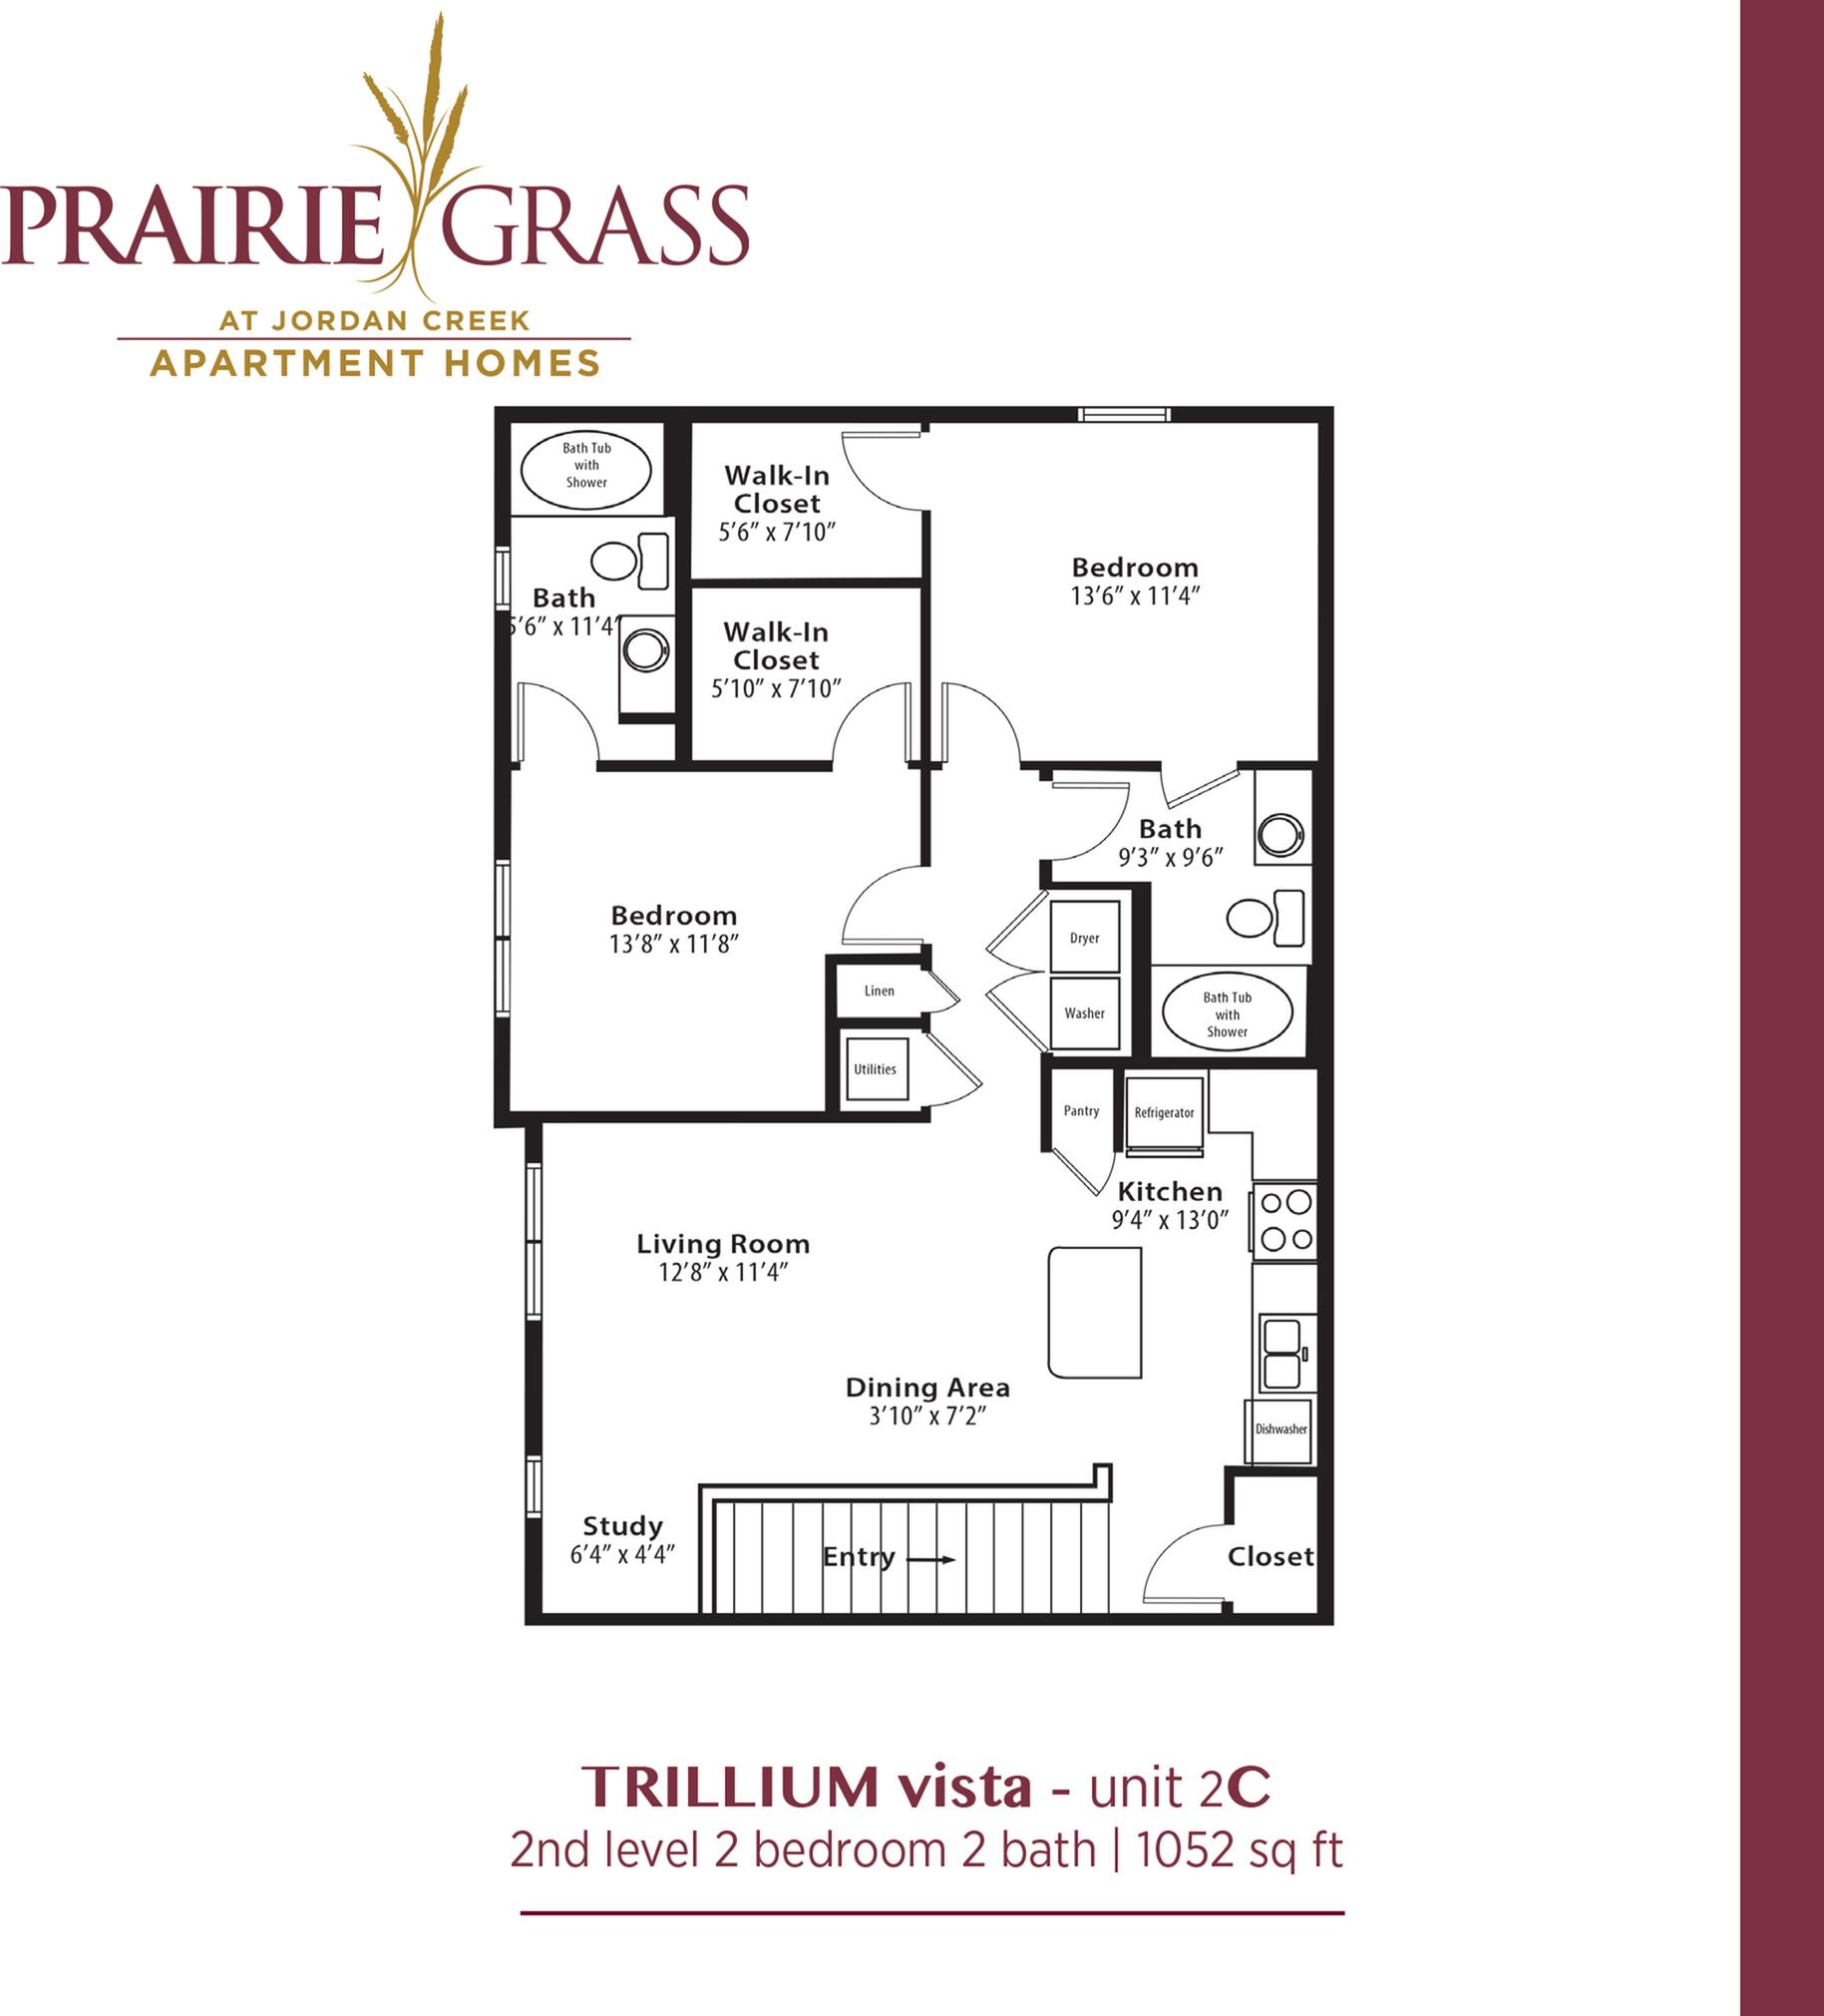 Trillium Vista - Upper 2 Bedroom